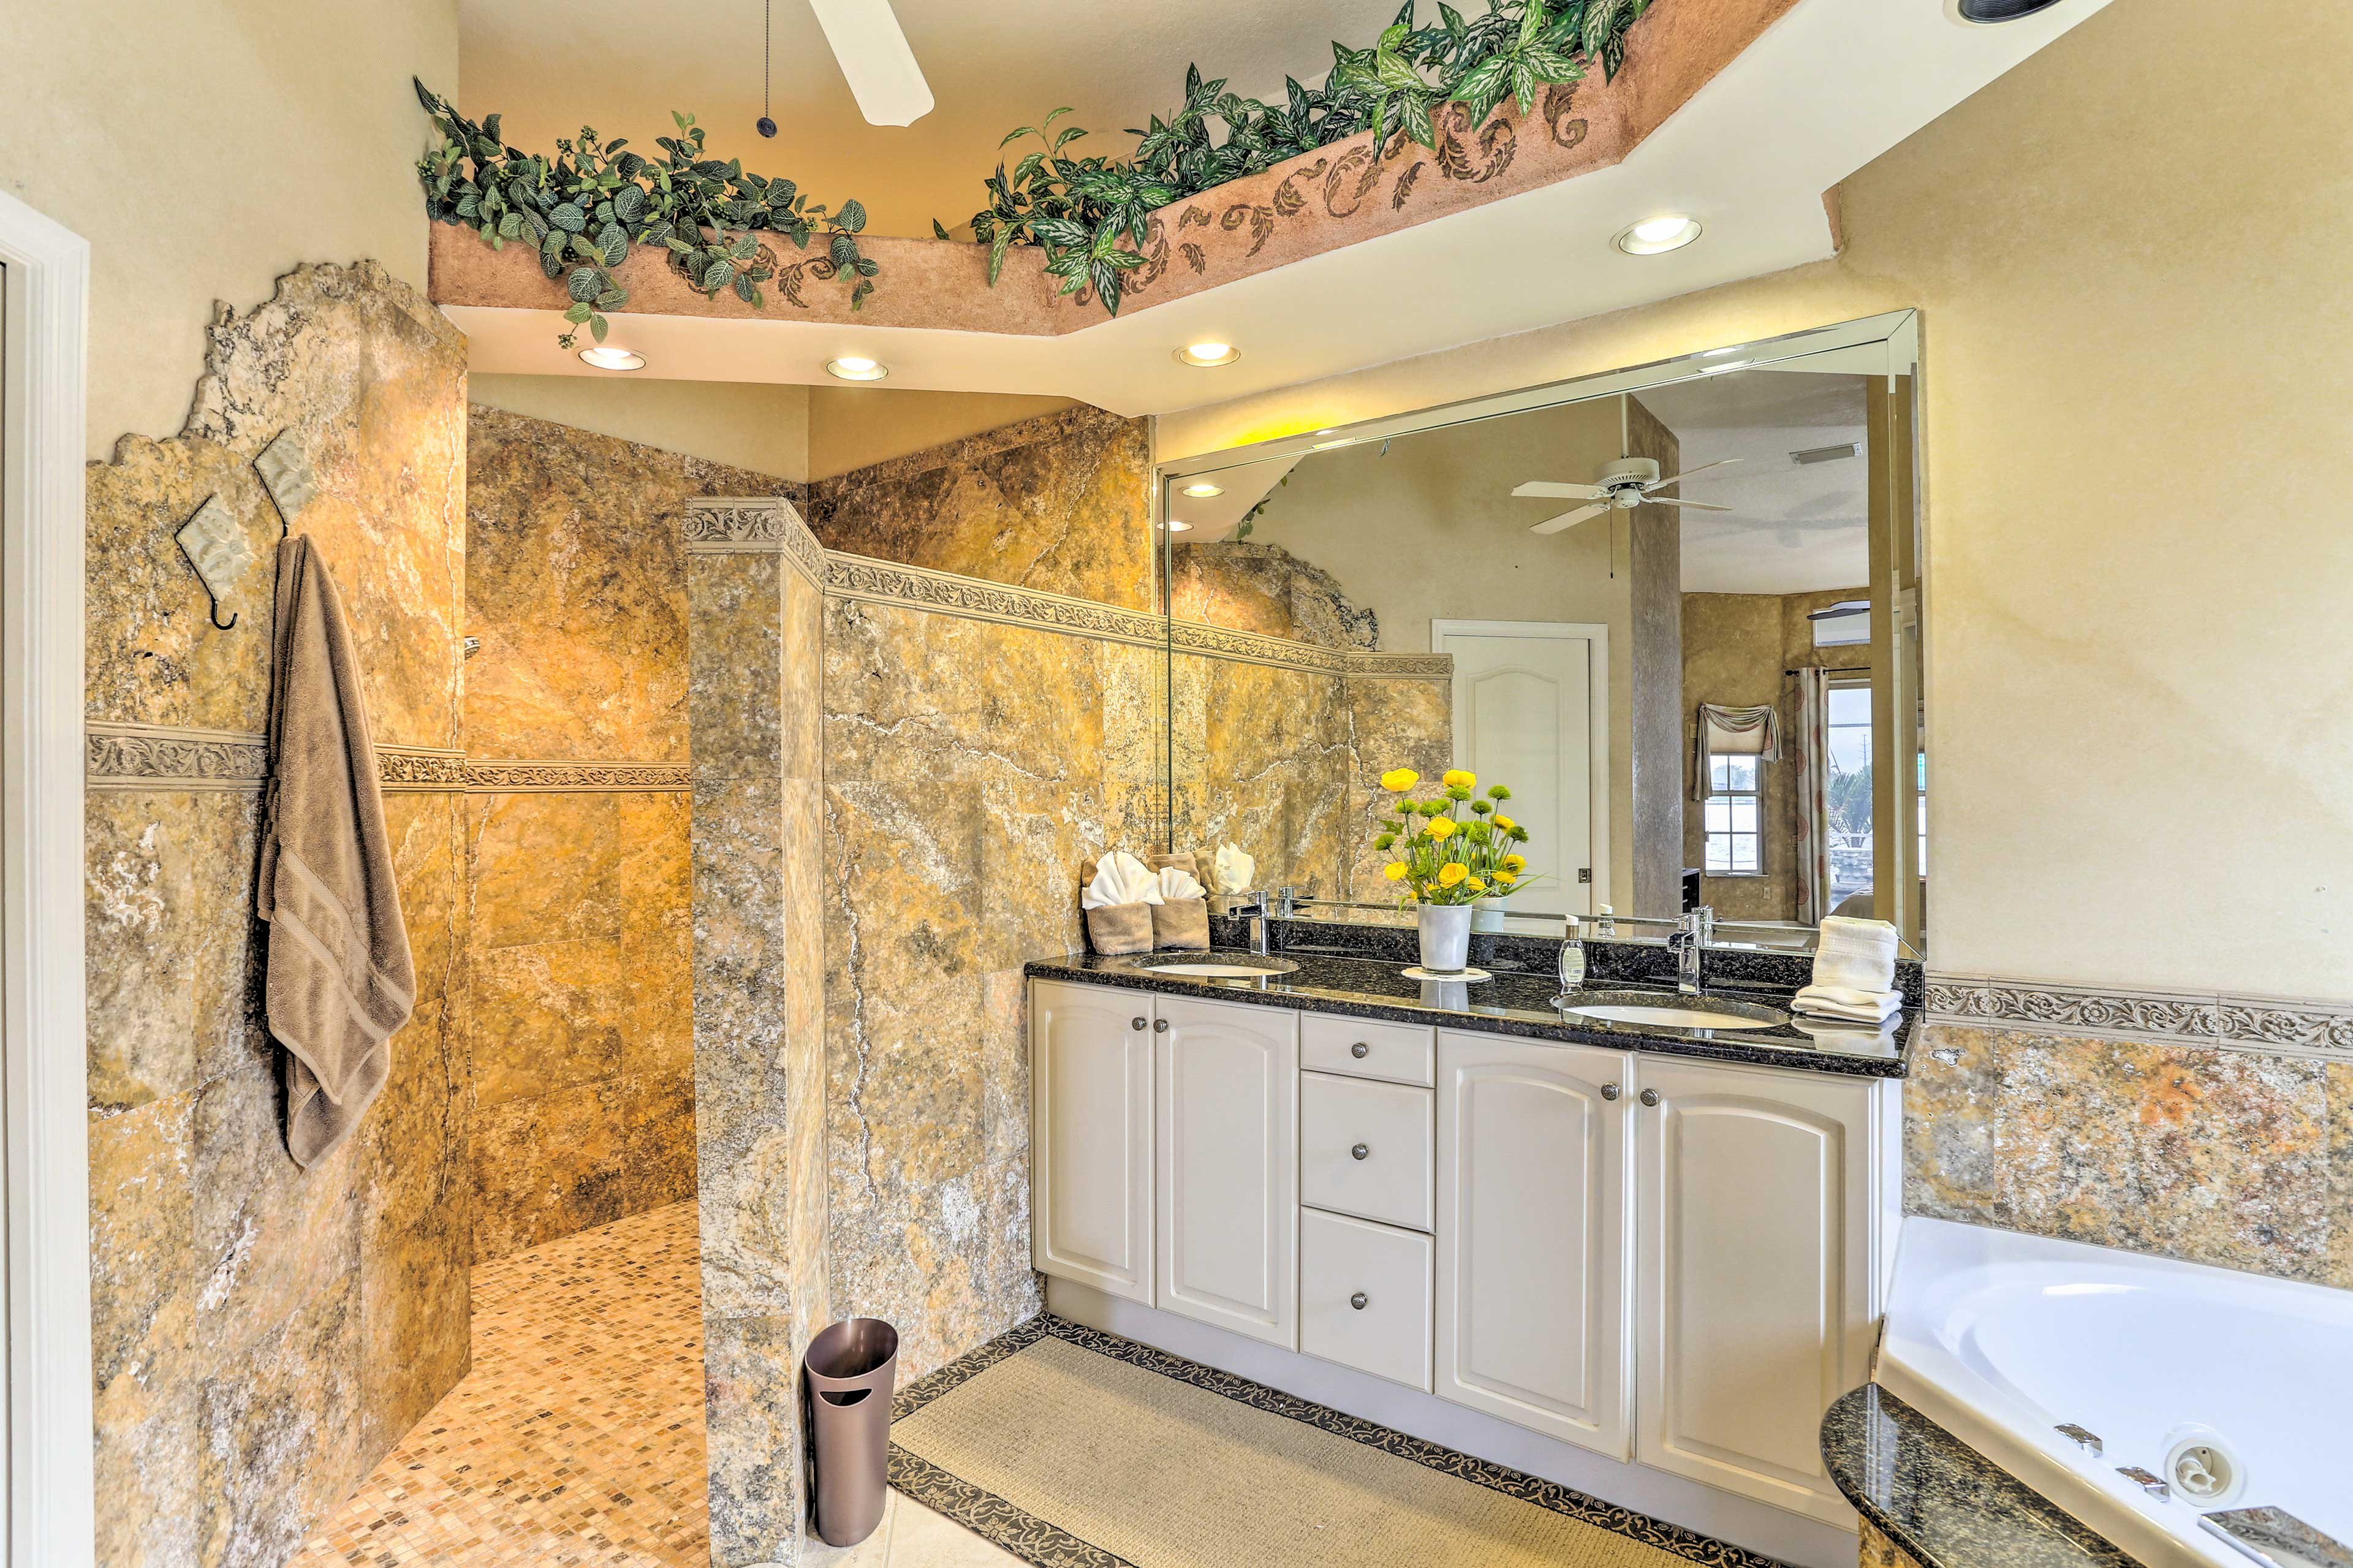 The en-suite bathroom boasts a custom shower with unique tiling.